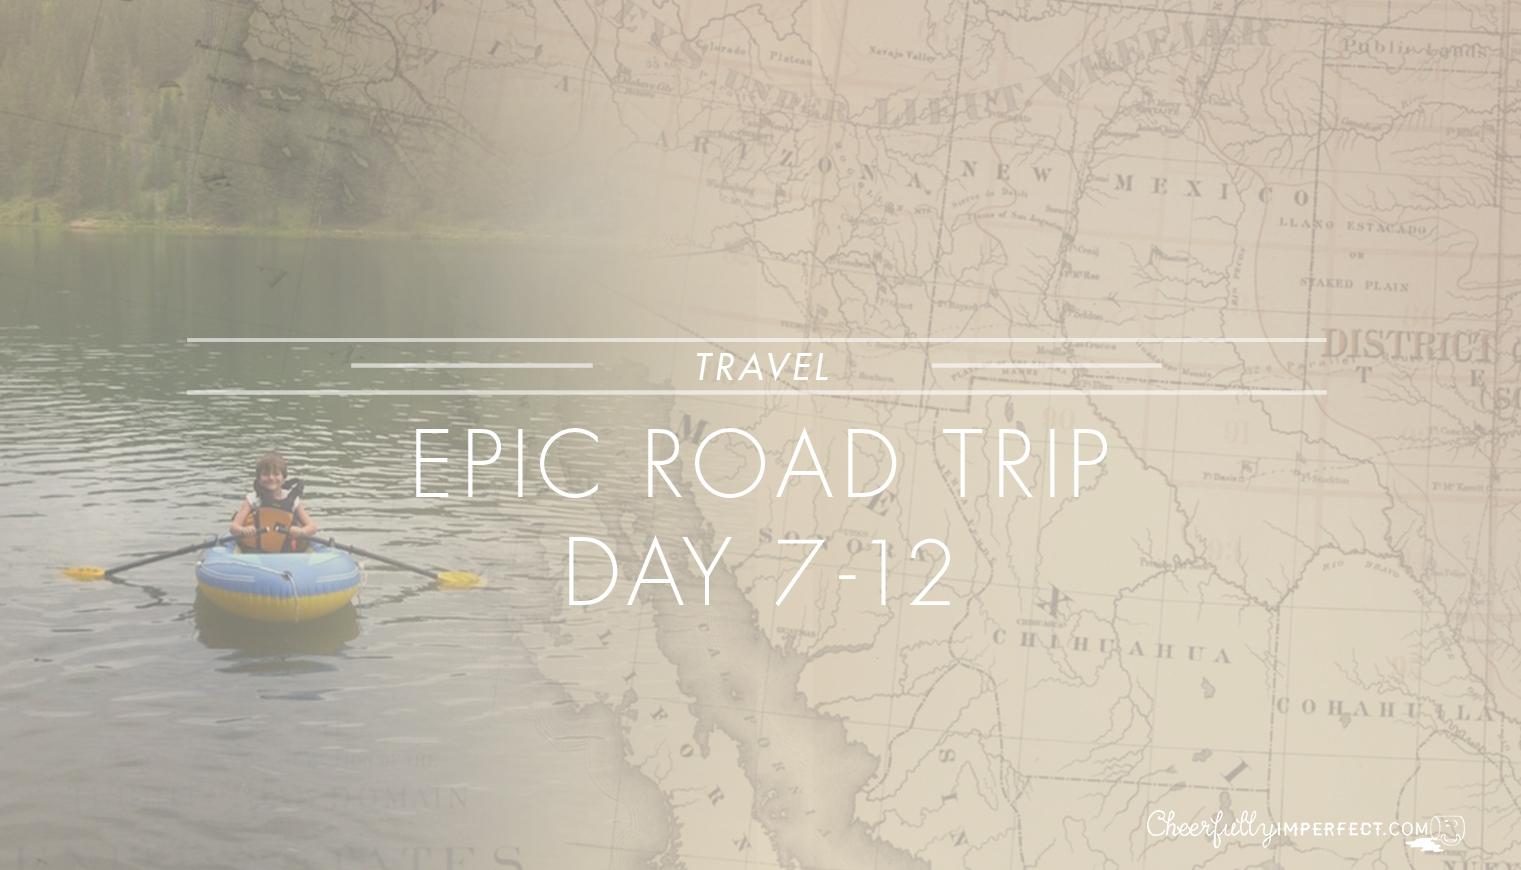 Epic Road Trip days 7-12, Alberta, Canada